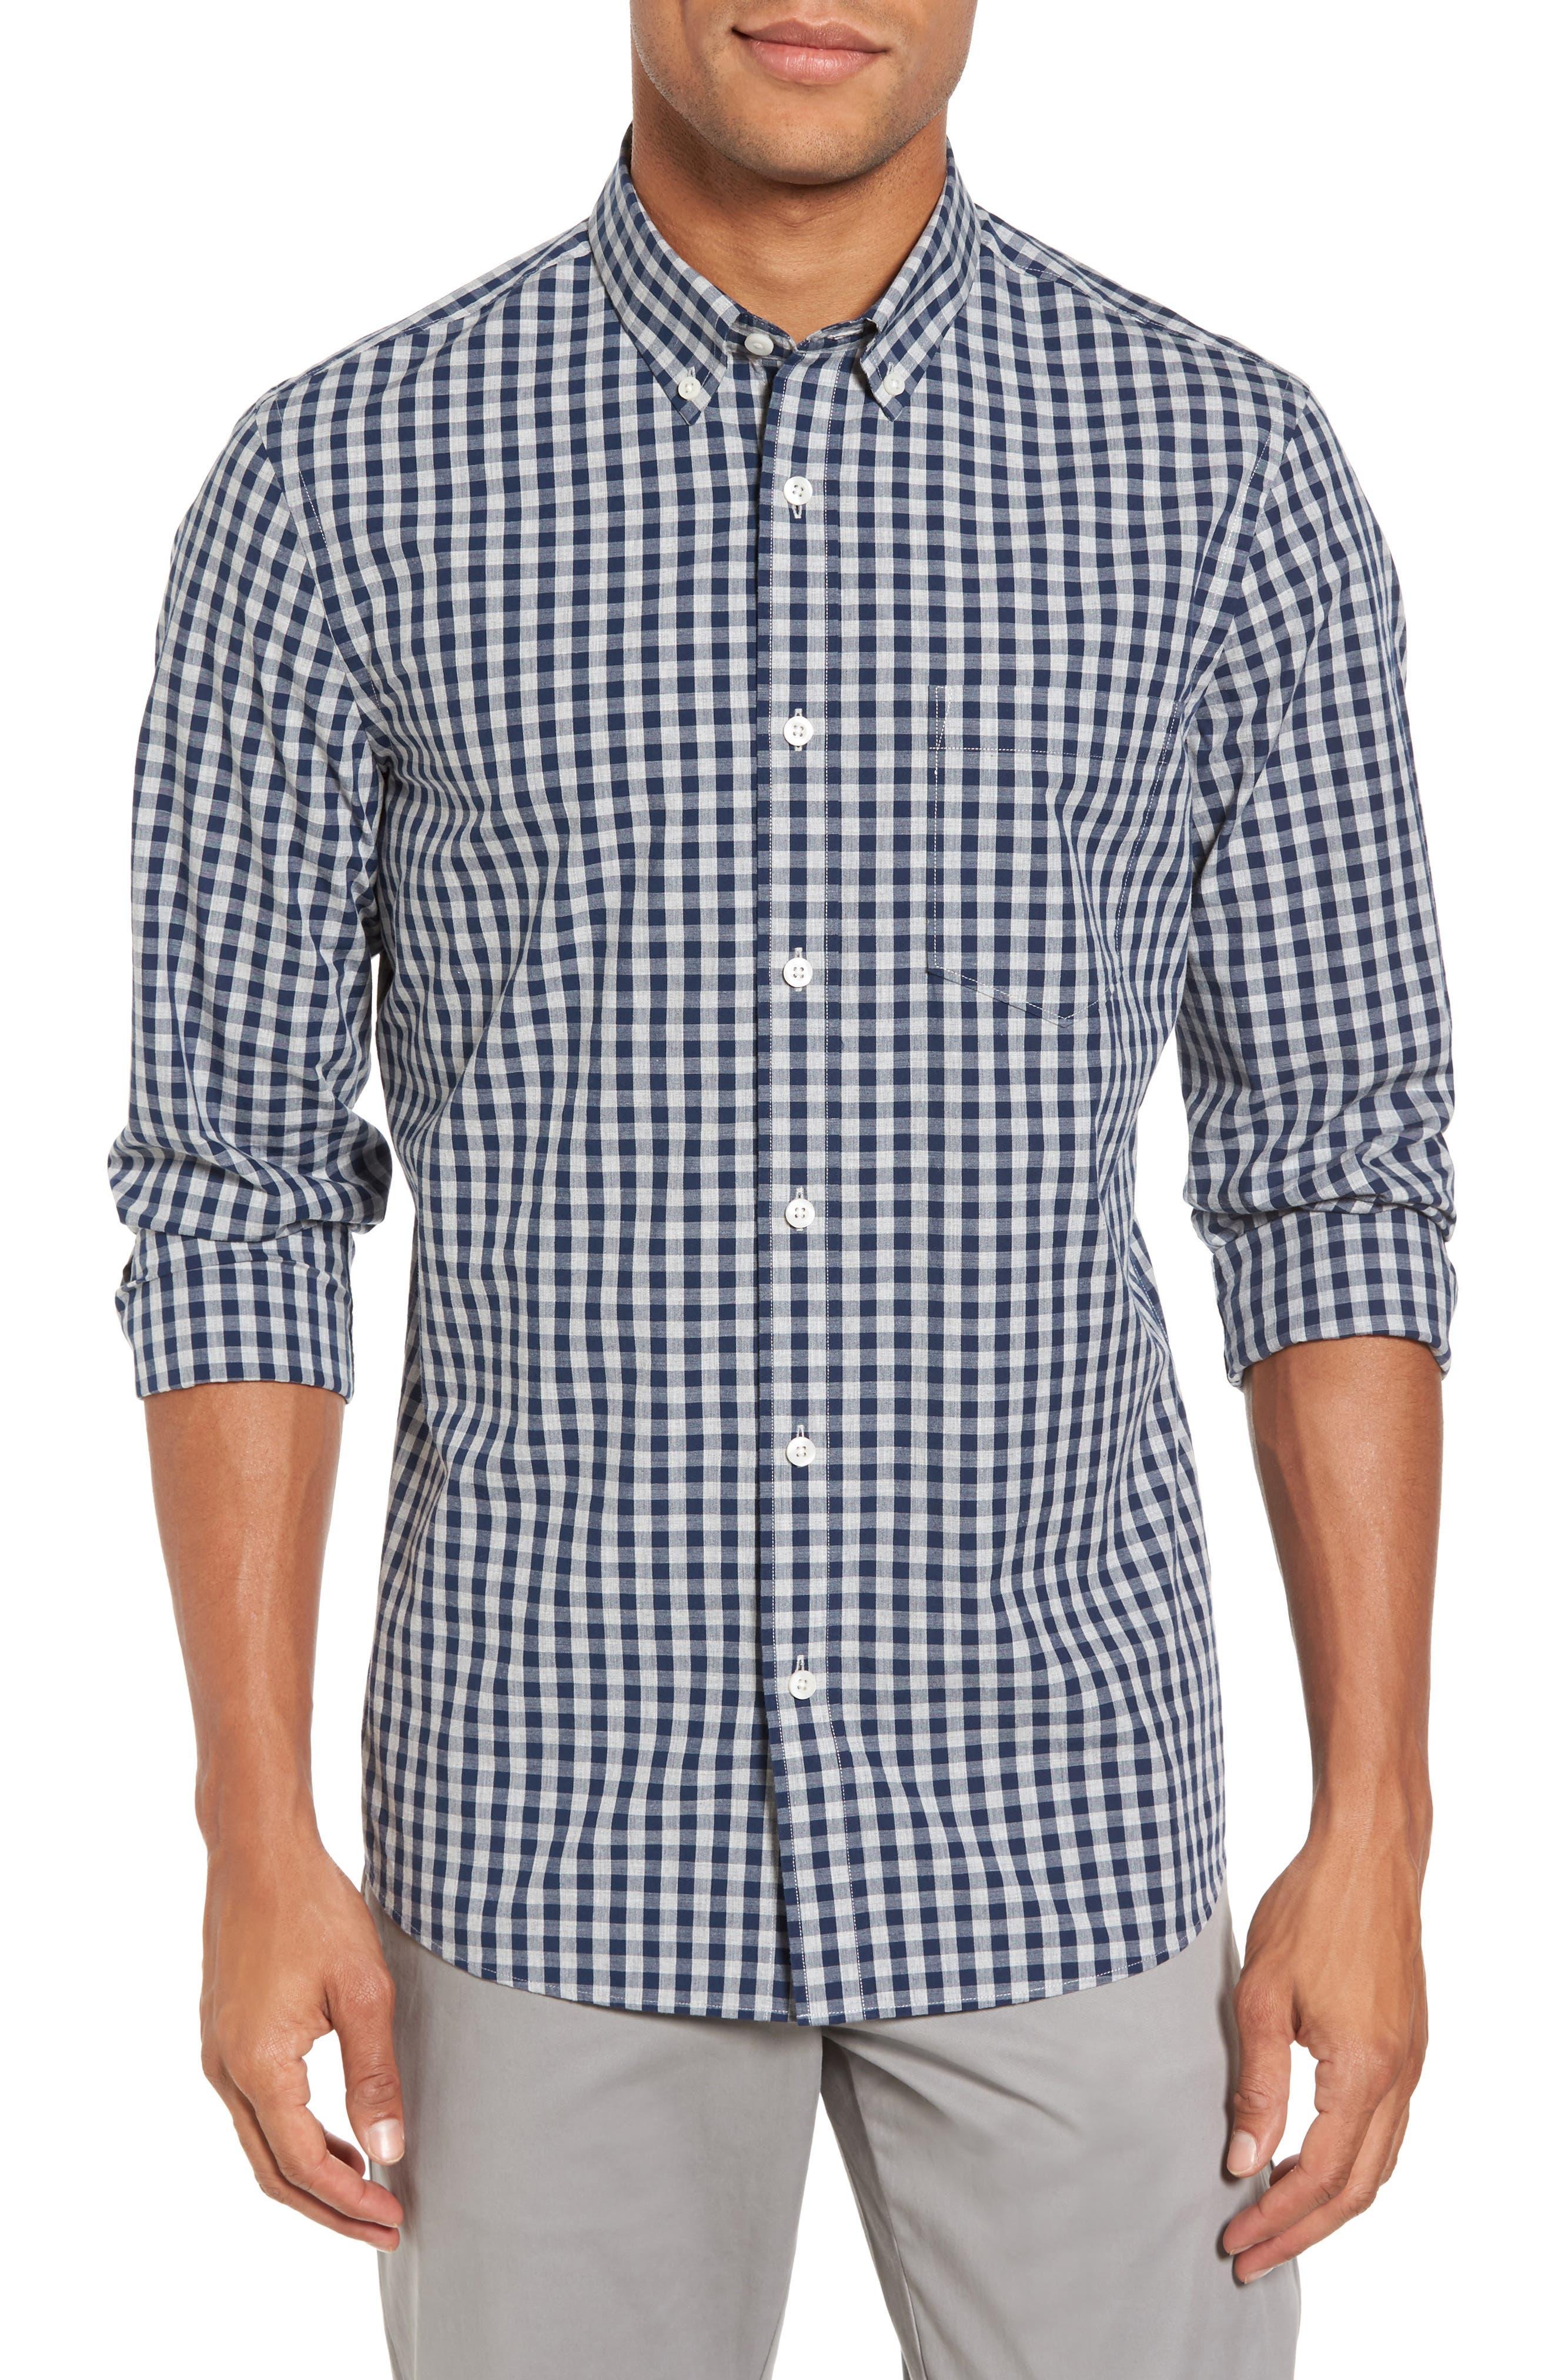 Spade Trim Fit Gingham Check Sport Shirt,                             Main thumbnail 1, color,                             Grey Shade Navy Gingham